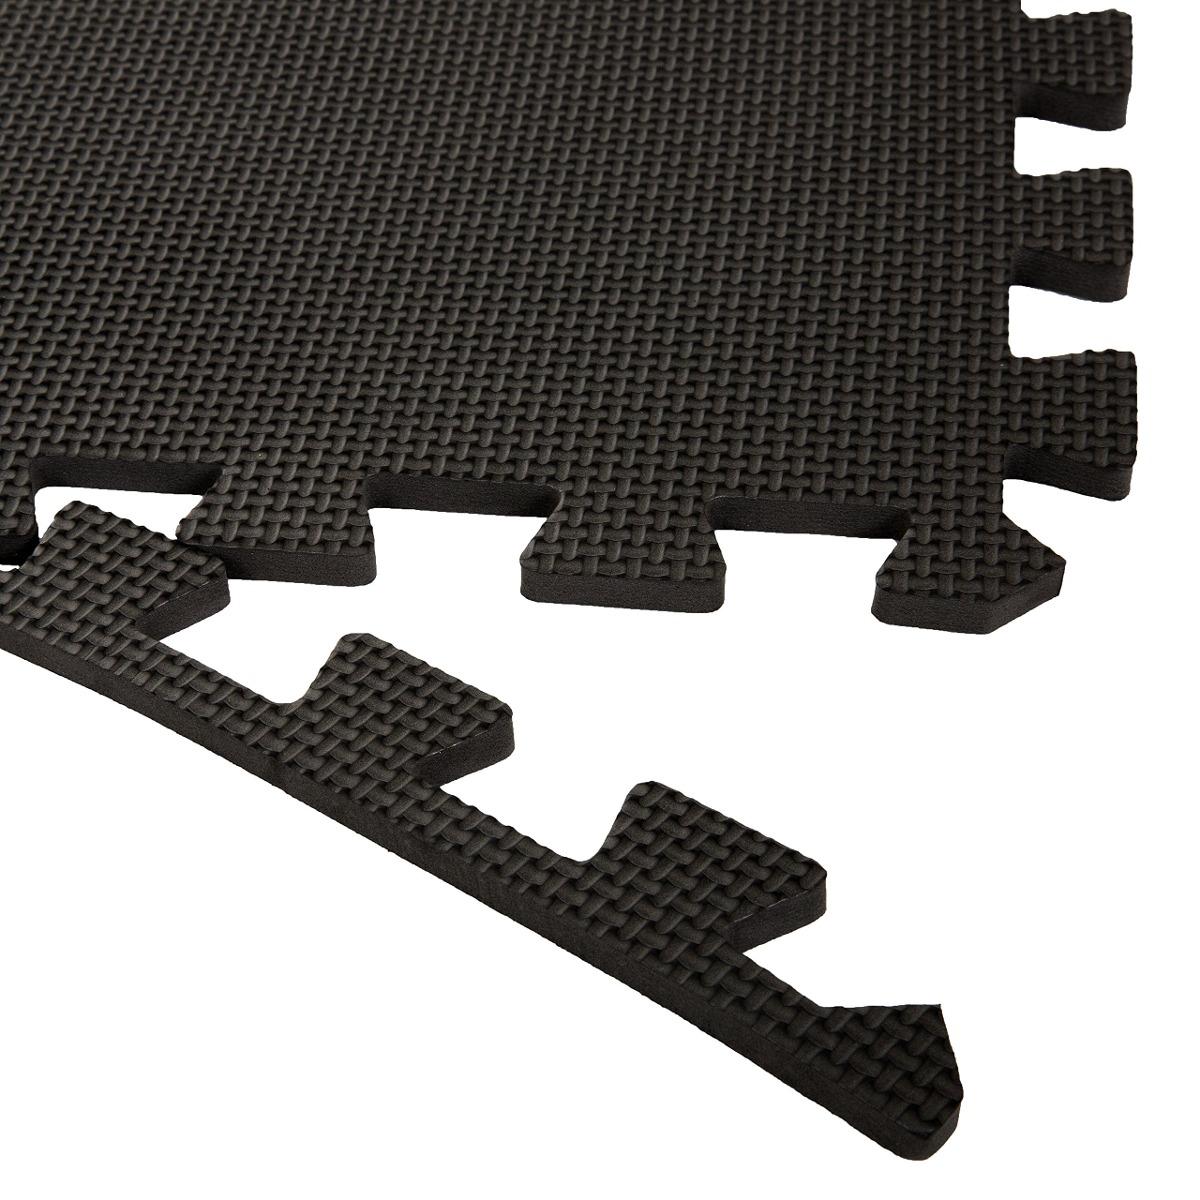 Foam Mat Floor Tiles Interlocking Eva Foam Padding By St 202 900 En Mercado Libre